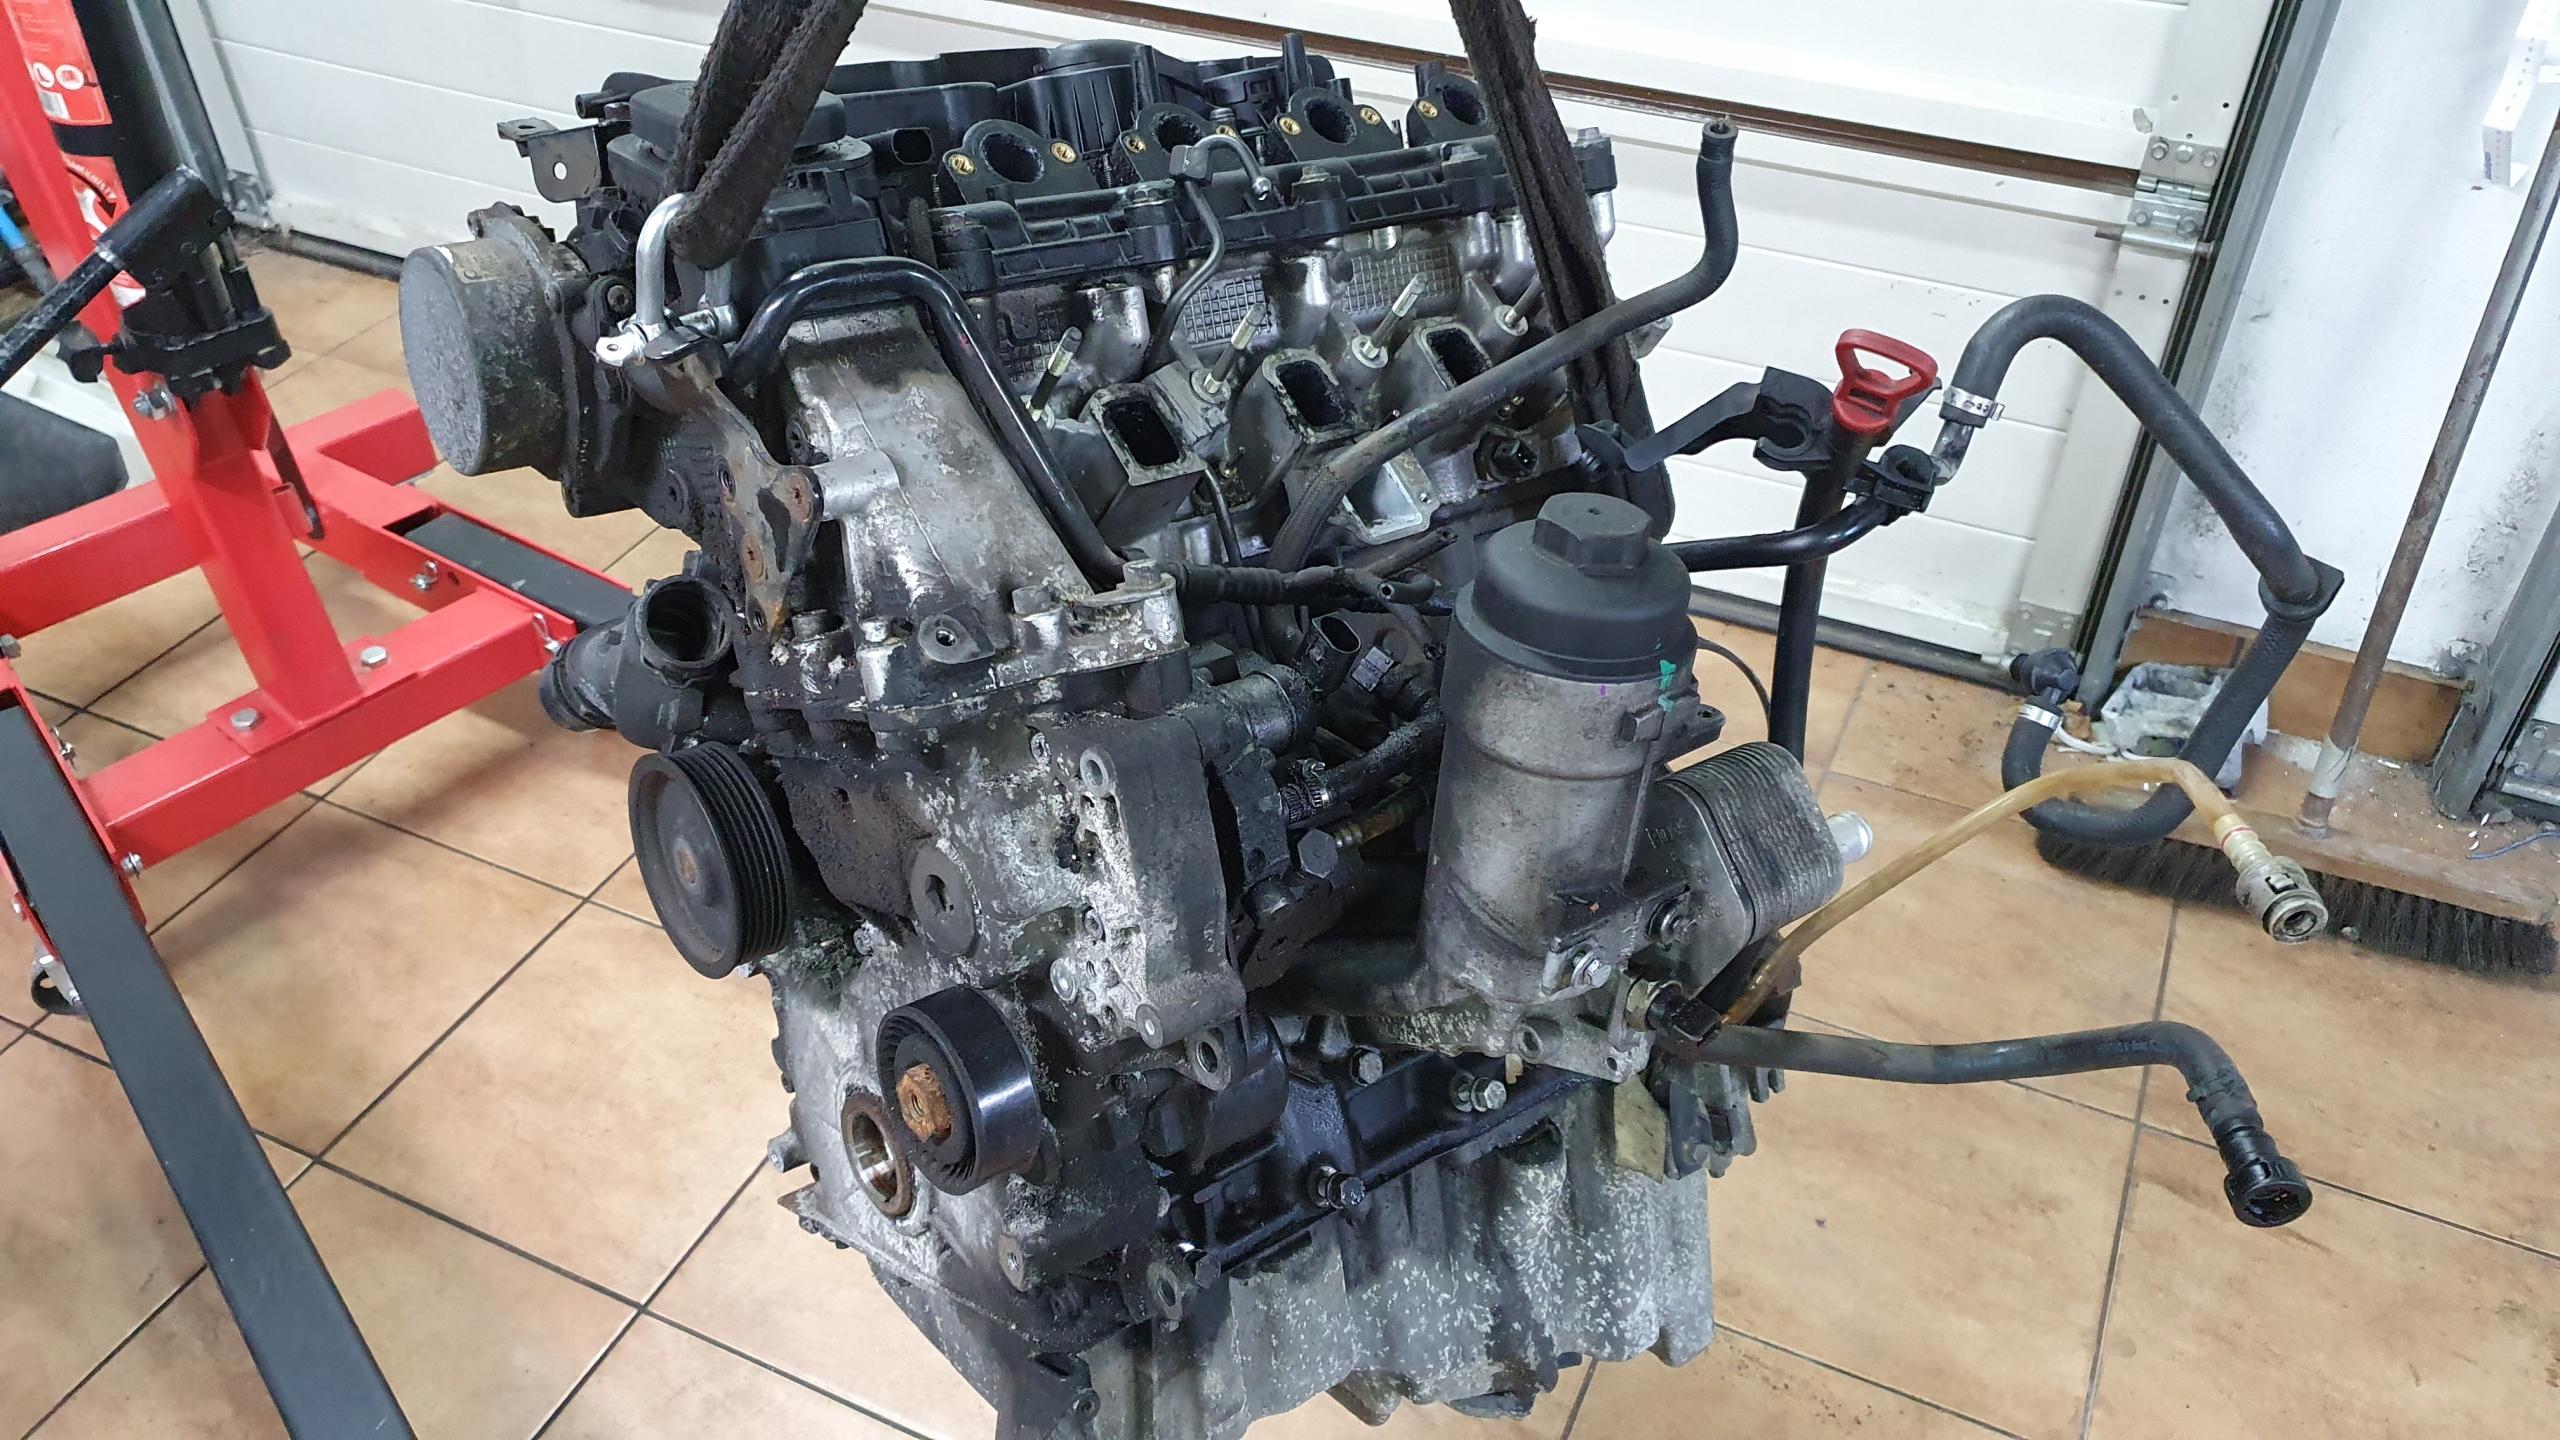 двигатель bmw e60 e61 дизель 520d m47 163km przedlift